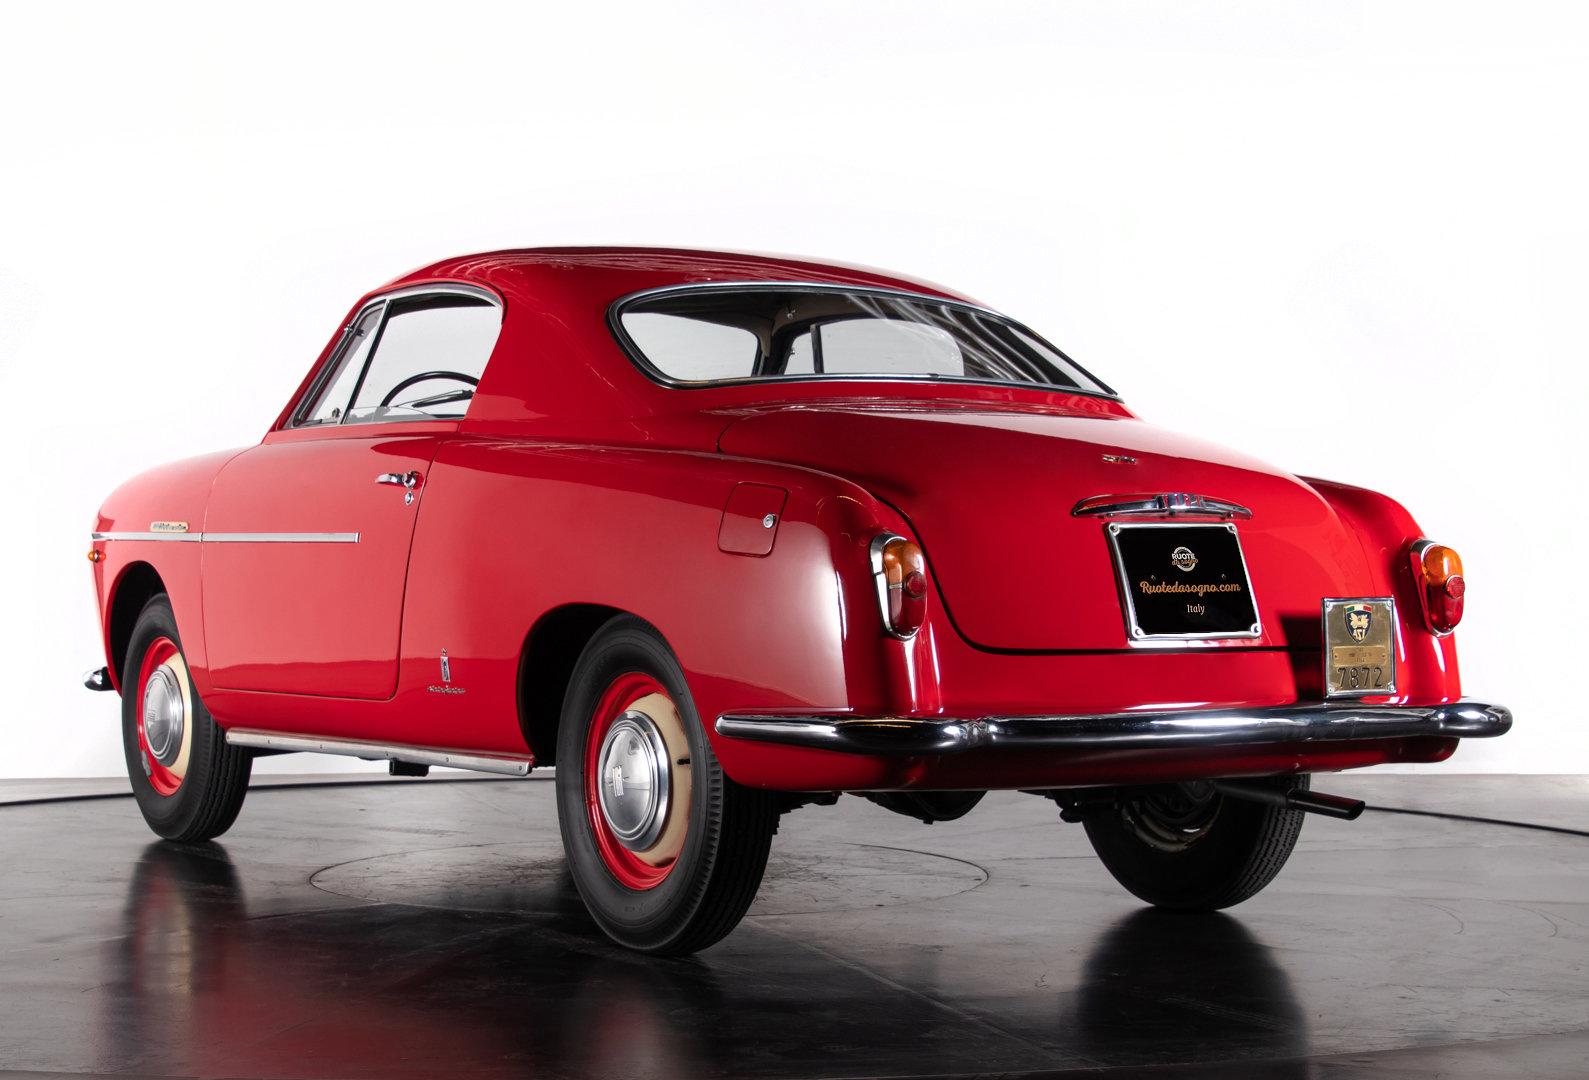 FIAT 1100/103 TV COUPè PININFARINA - 1954 For Sale (picture 4 of 6)